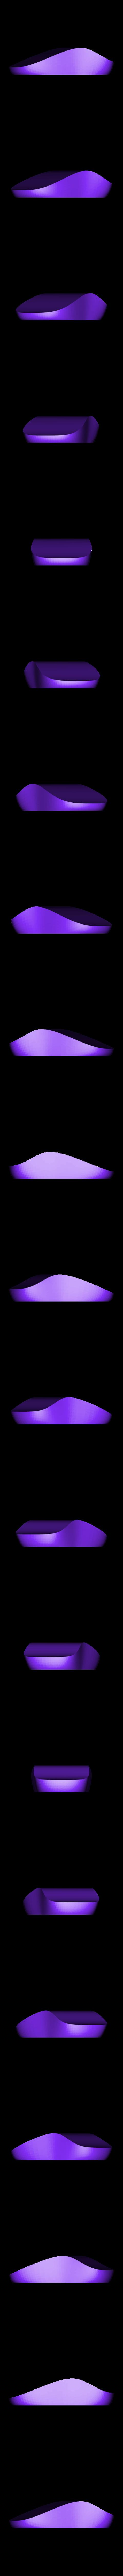 V2__mouse_base.STL Download free STL file Multi-Color Computer Mouse Model: Industrial/Product Design • 3D printable model, MosaicManufacturing